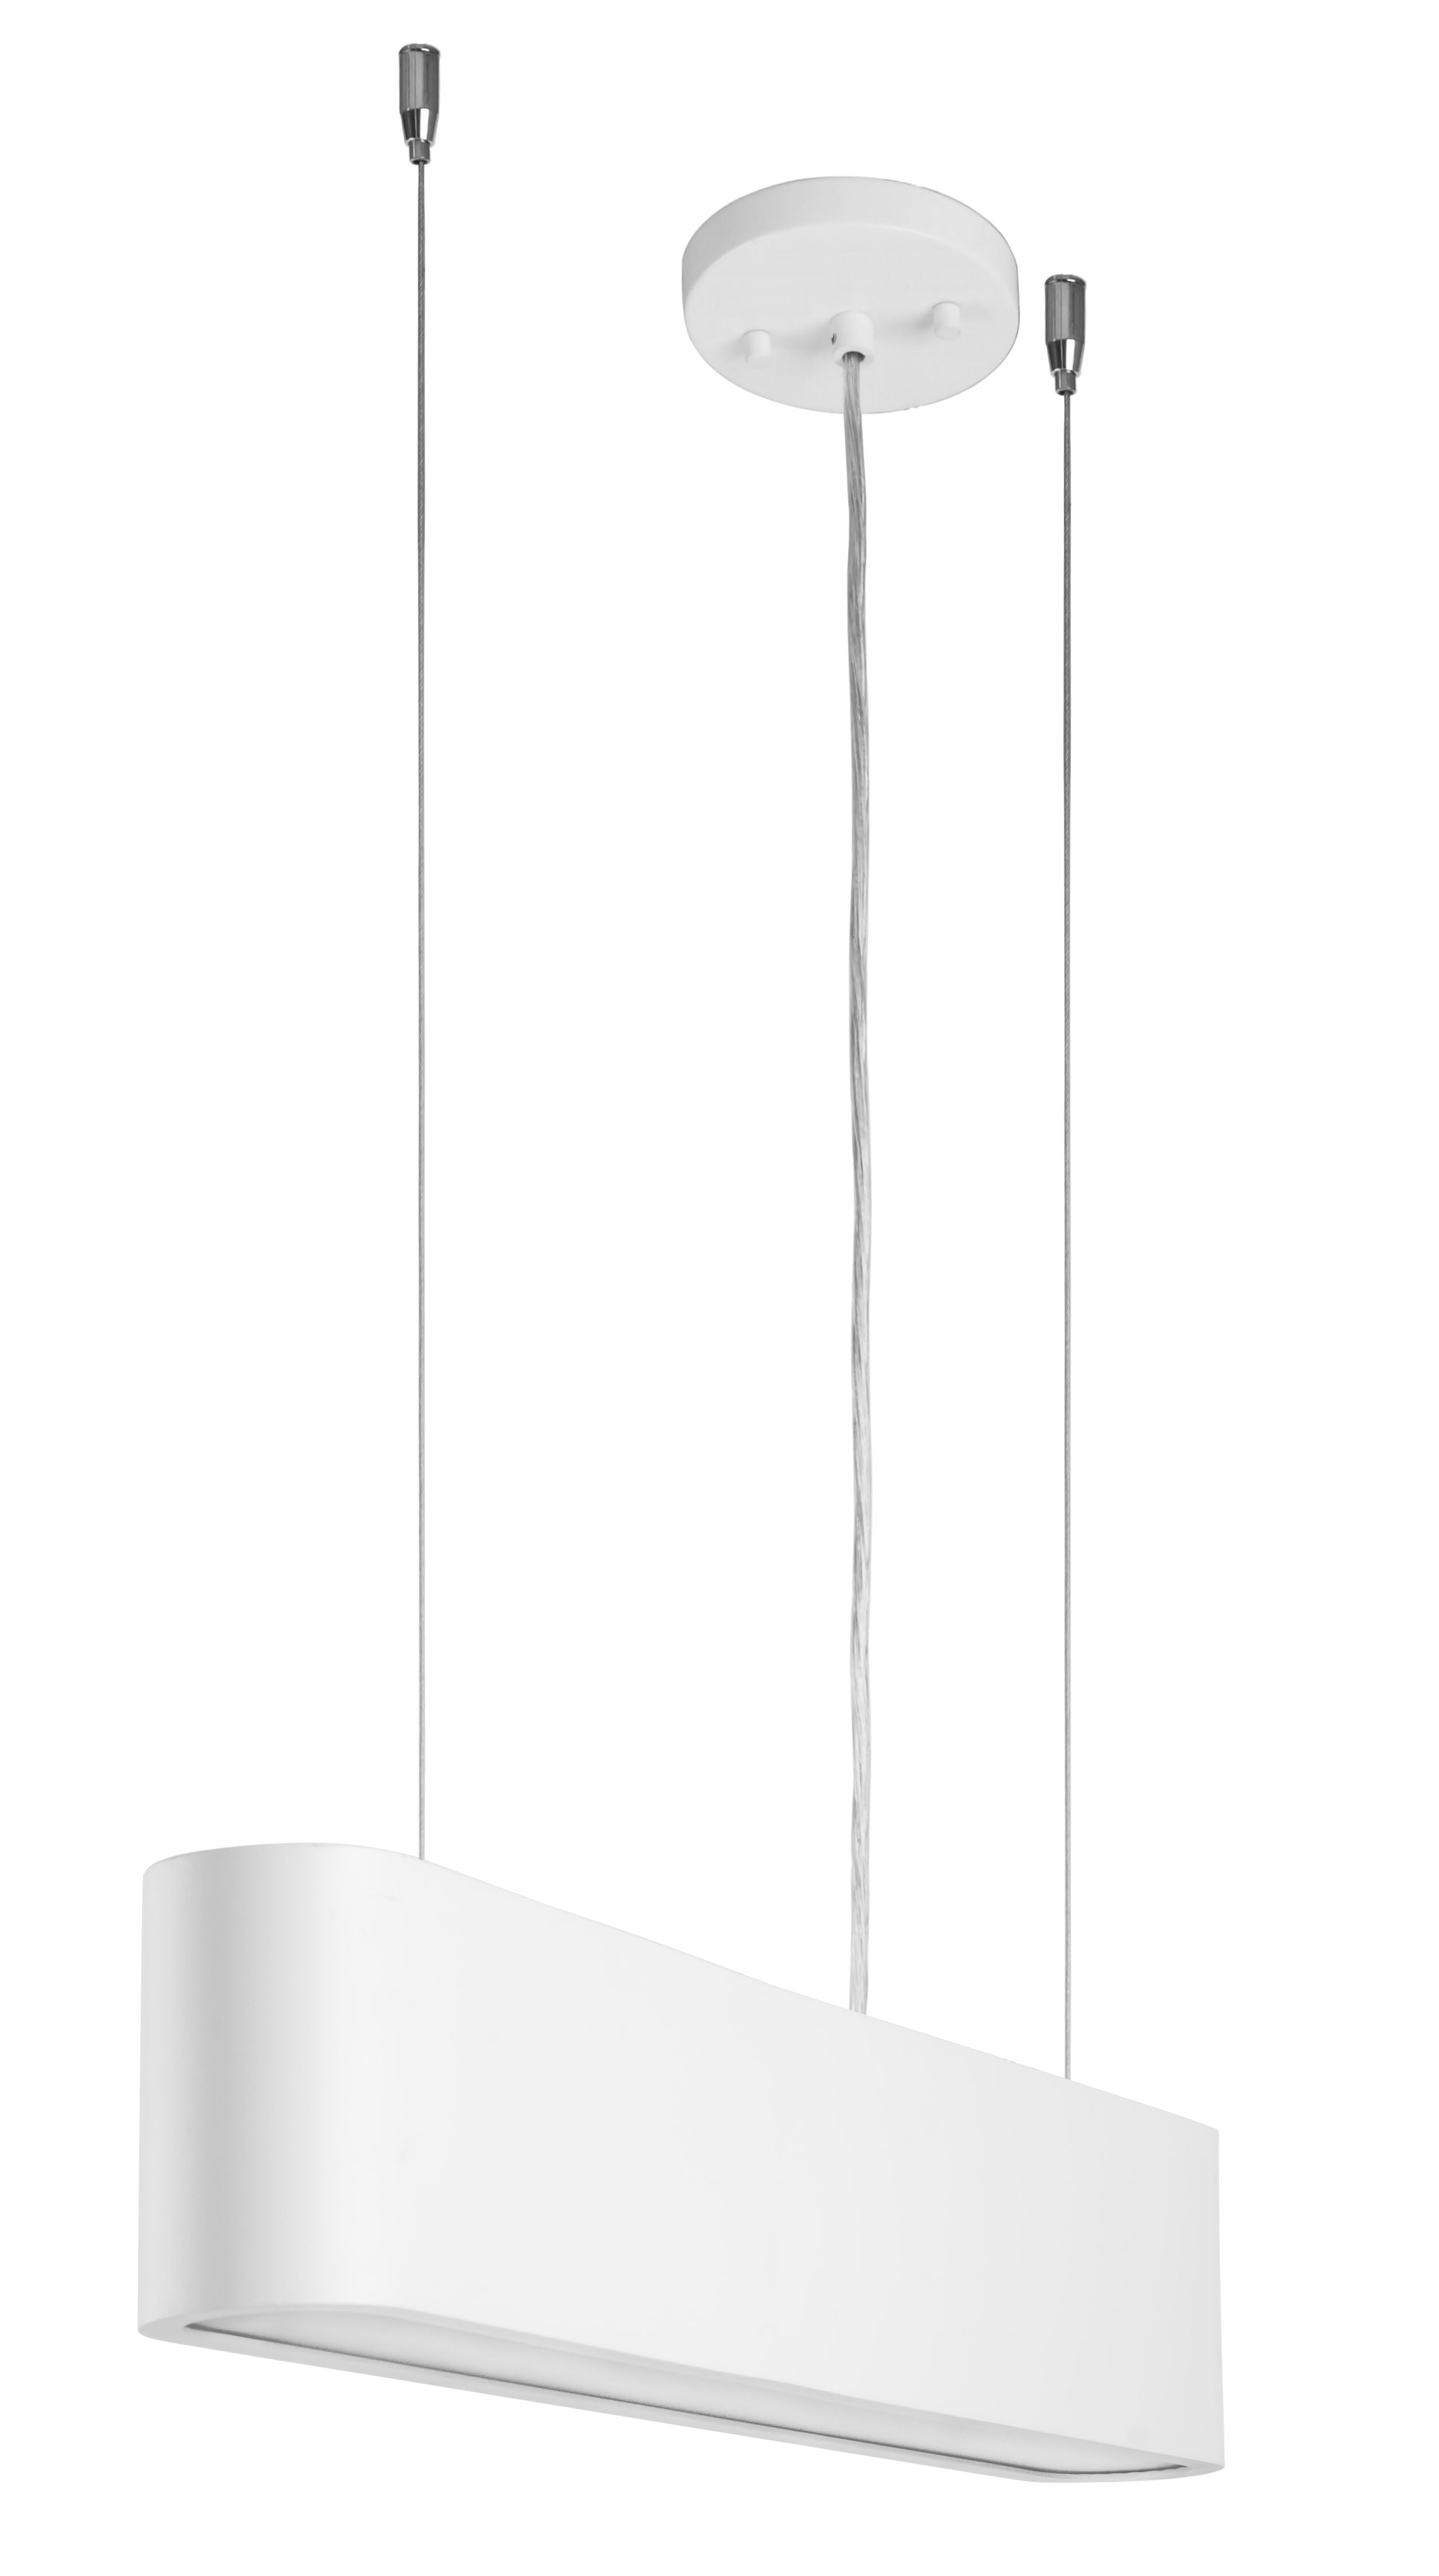 Lampă cu pandantiv industrial alb Illumina LED 28W